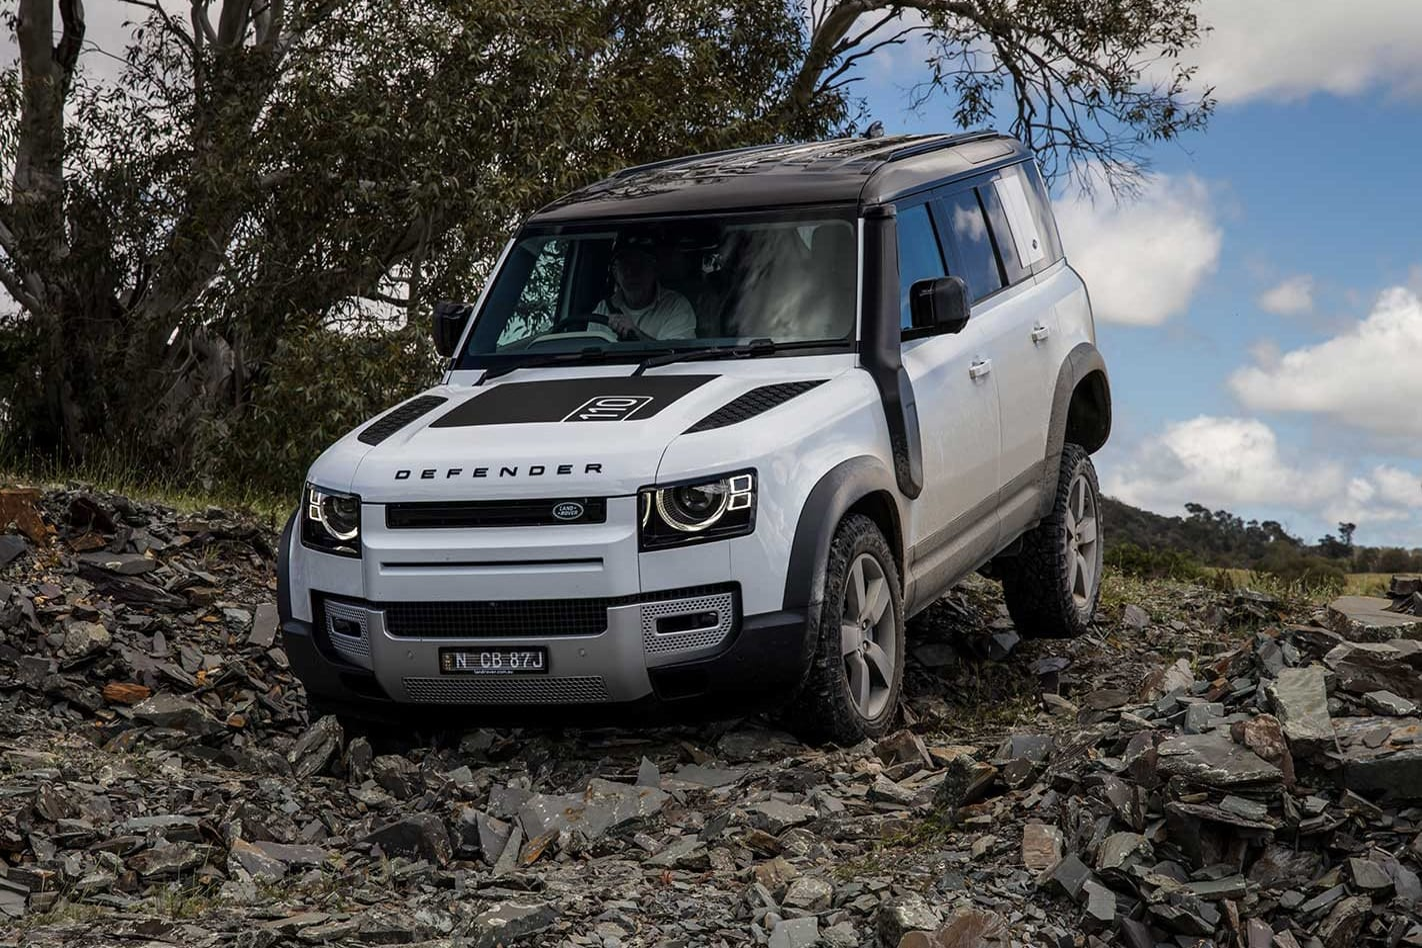 Land Rover Defender 110 P400 SE review